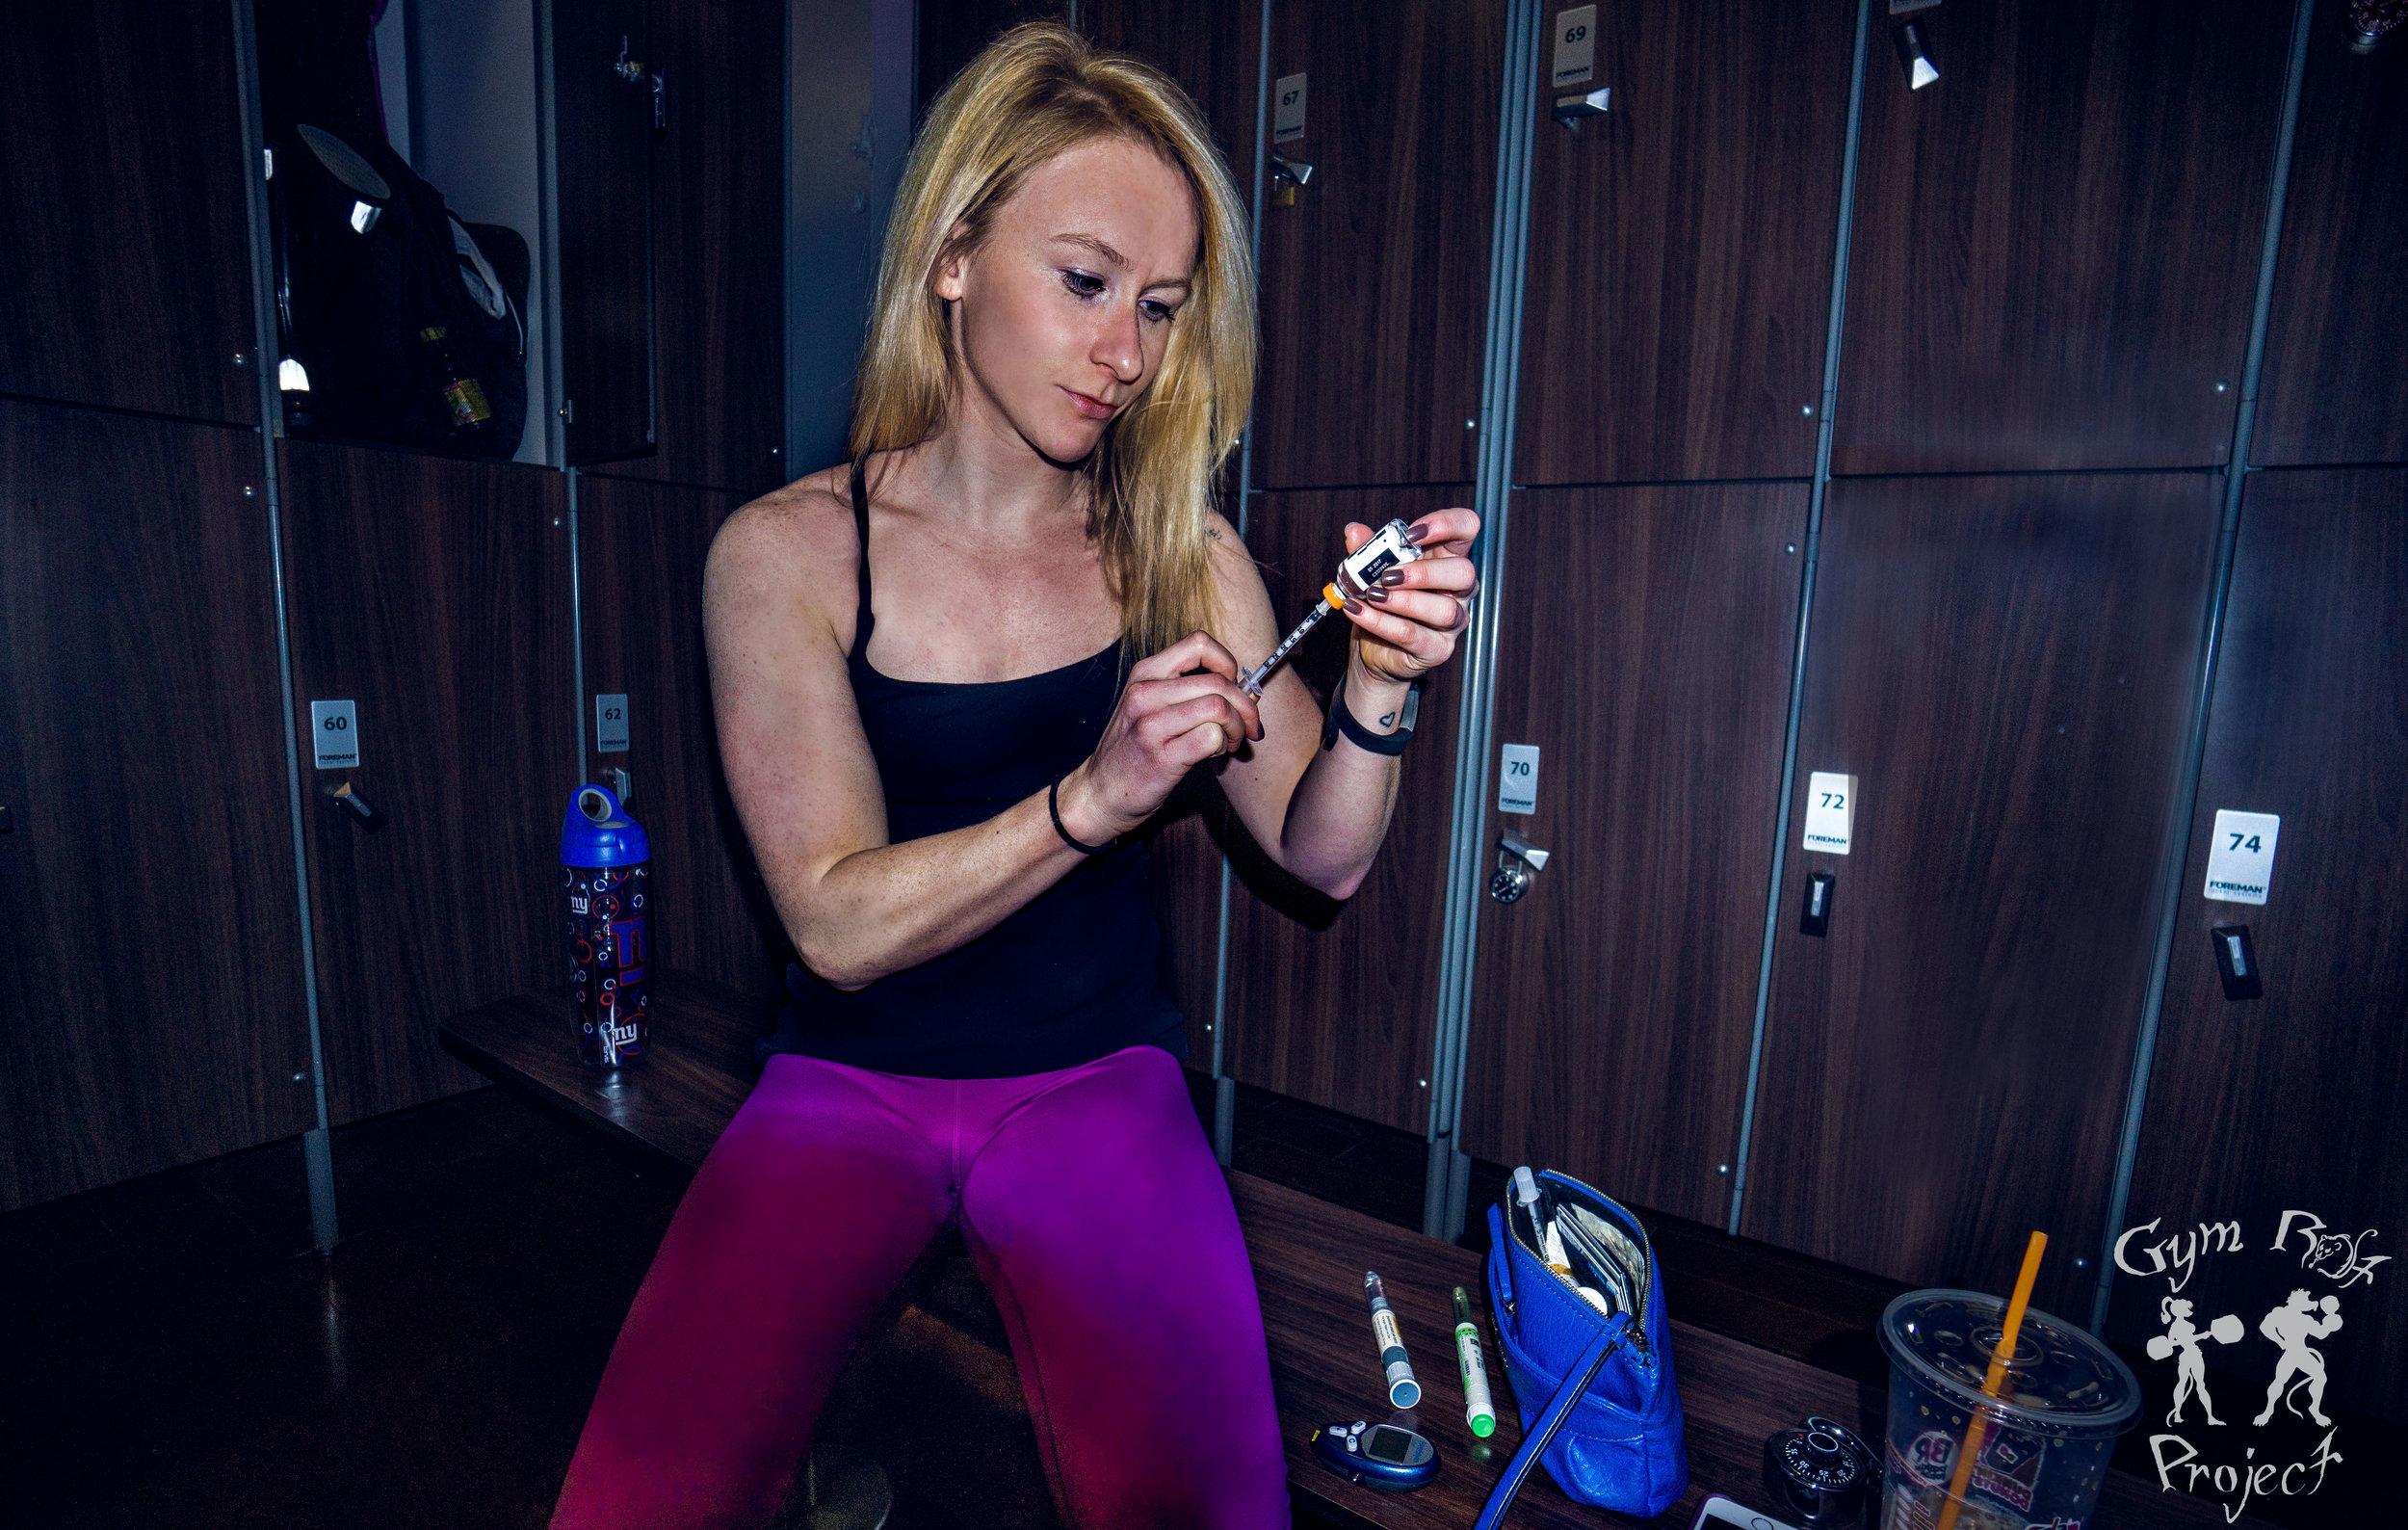 lisa-gym-rat-project-vickygood-photography